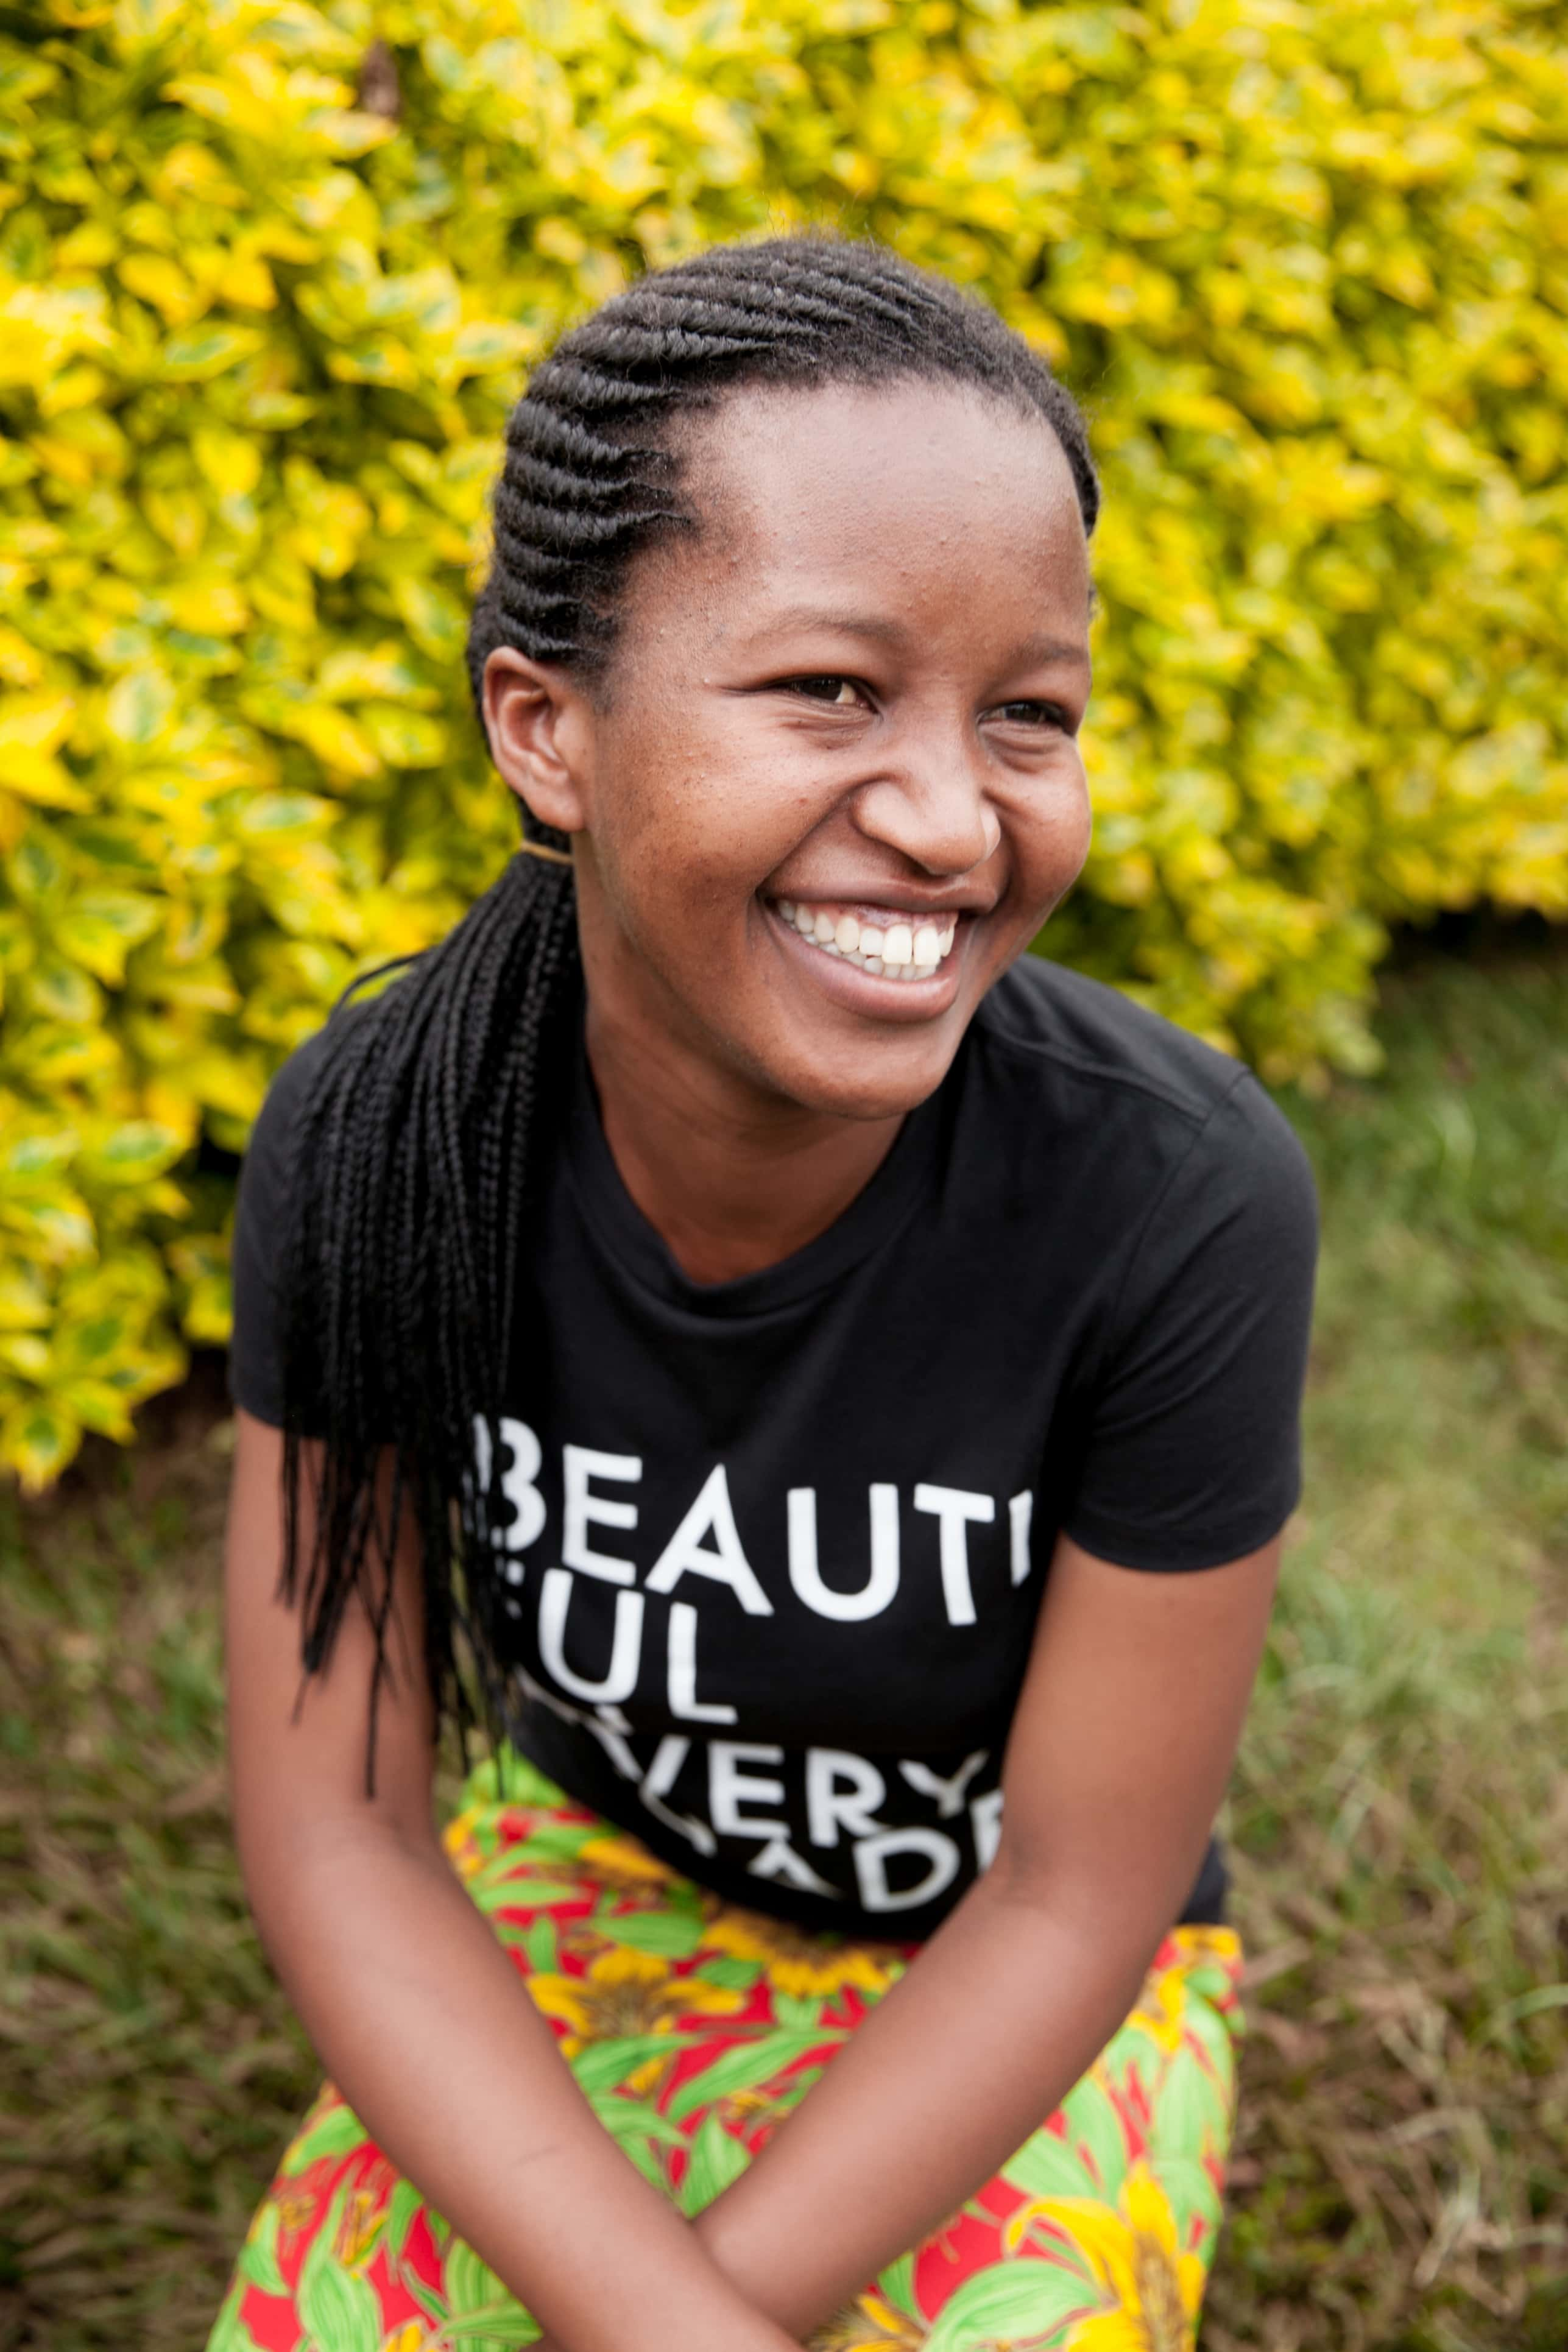 Marie Aimee vodi ženski center Nyamirambo v Ruandi